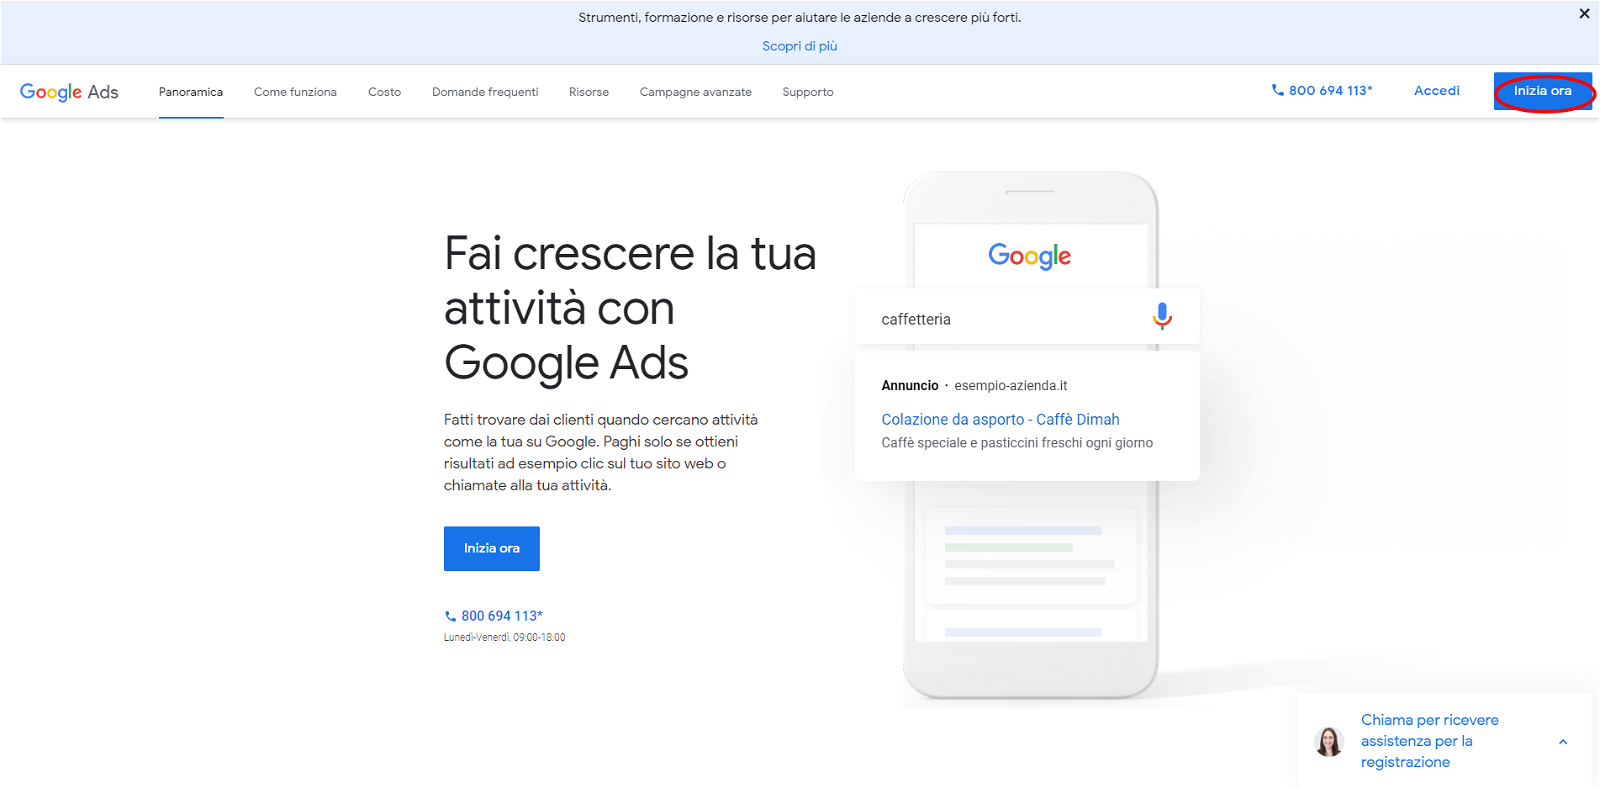 Account Google-Ads-pagina start